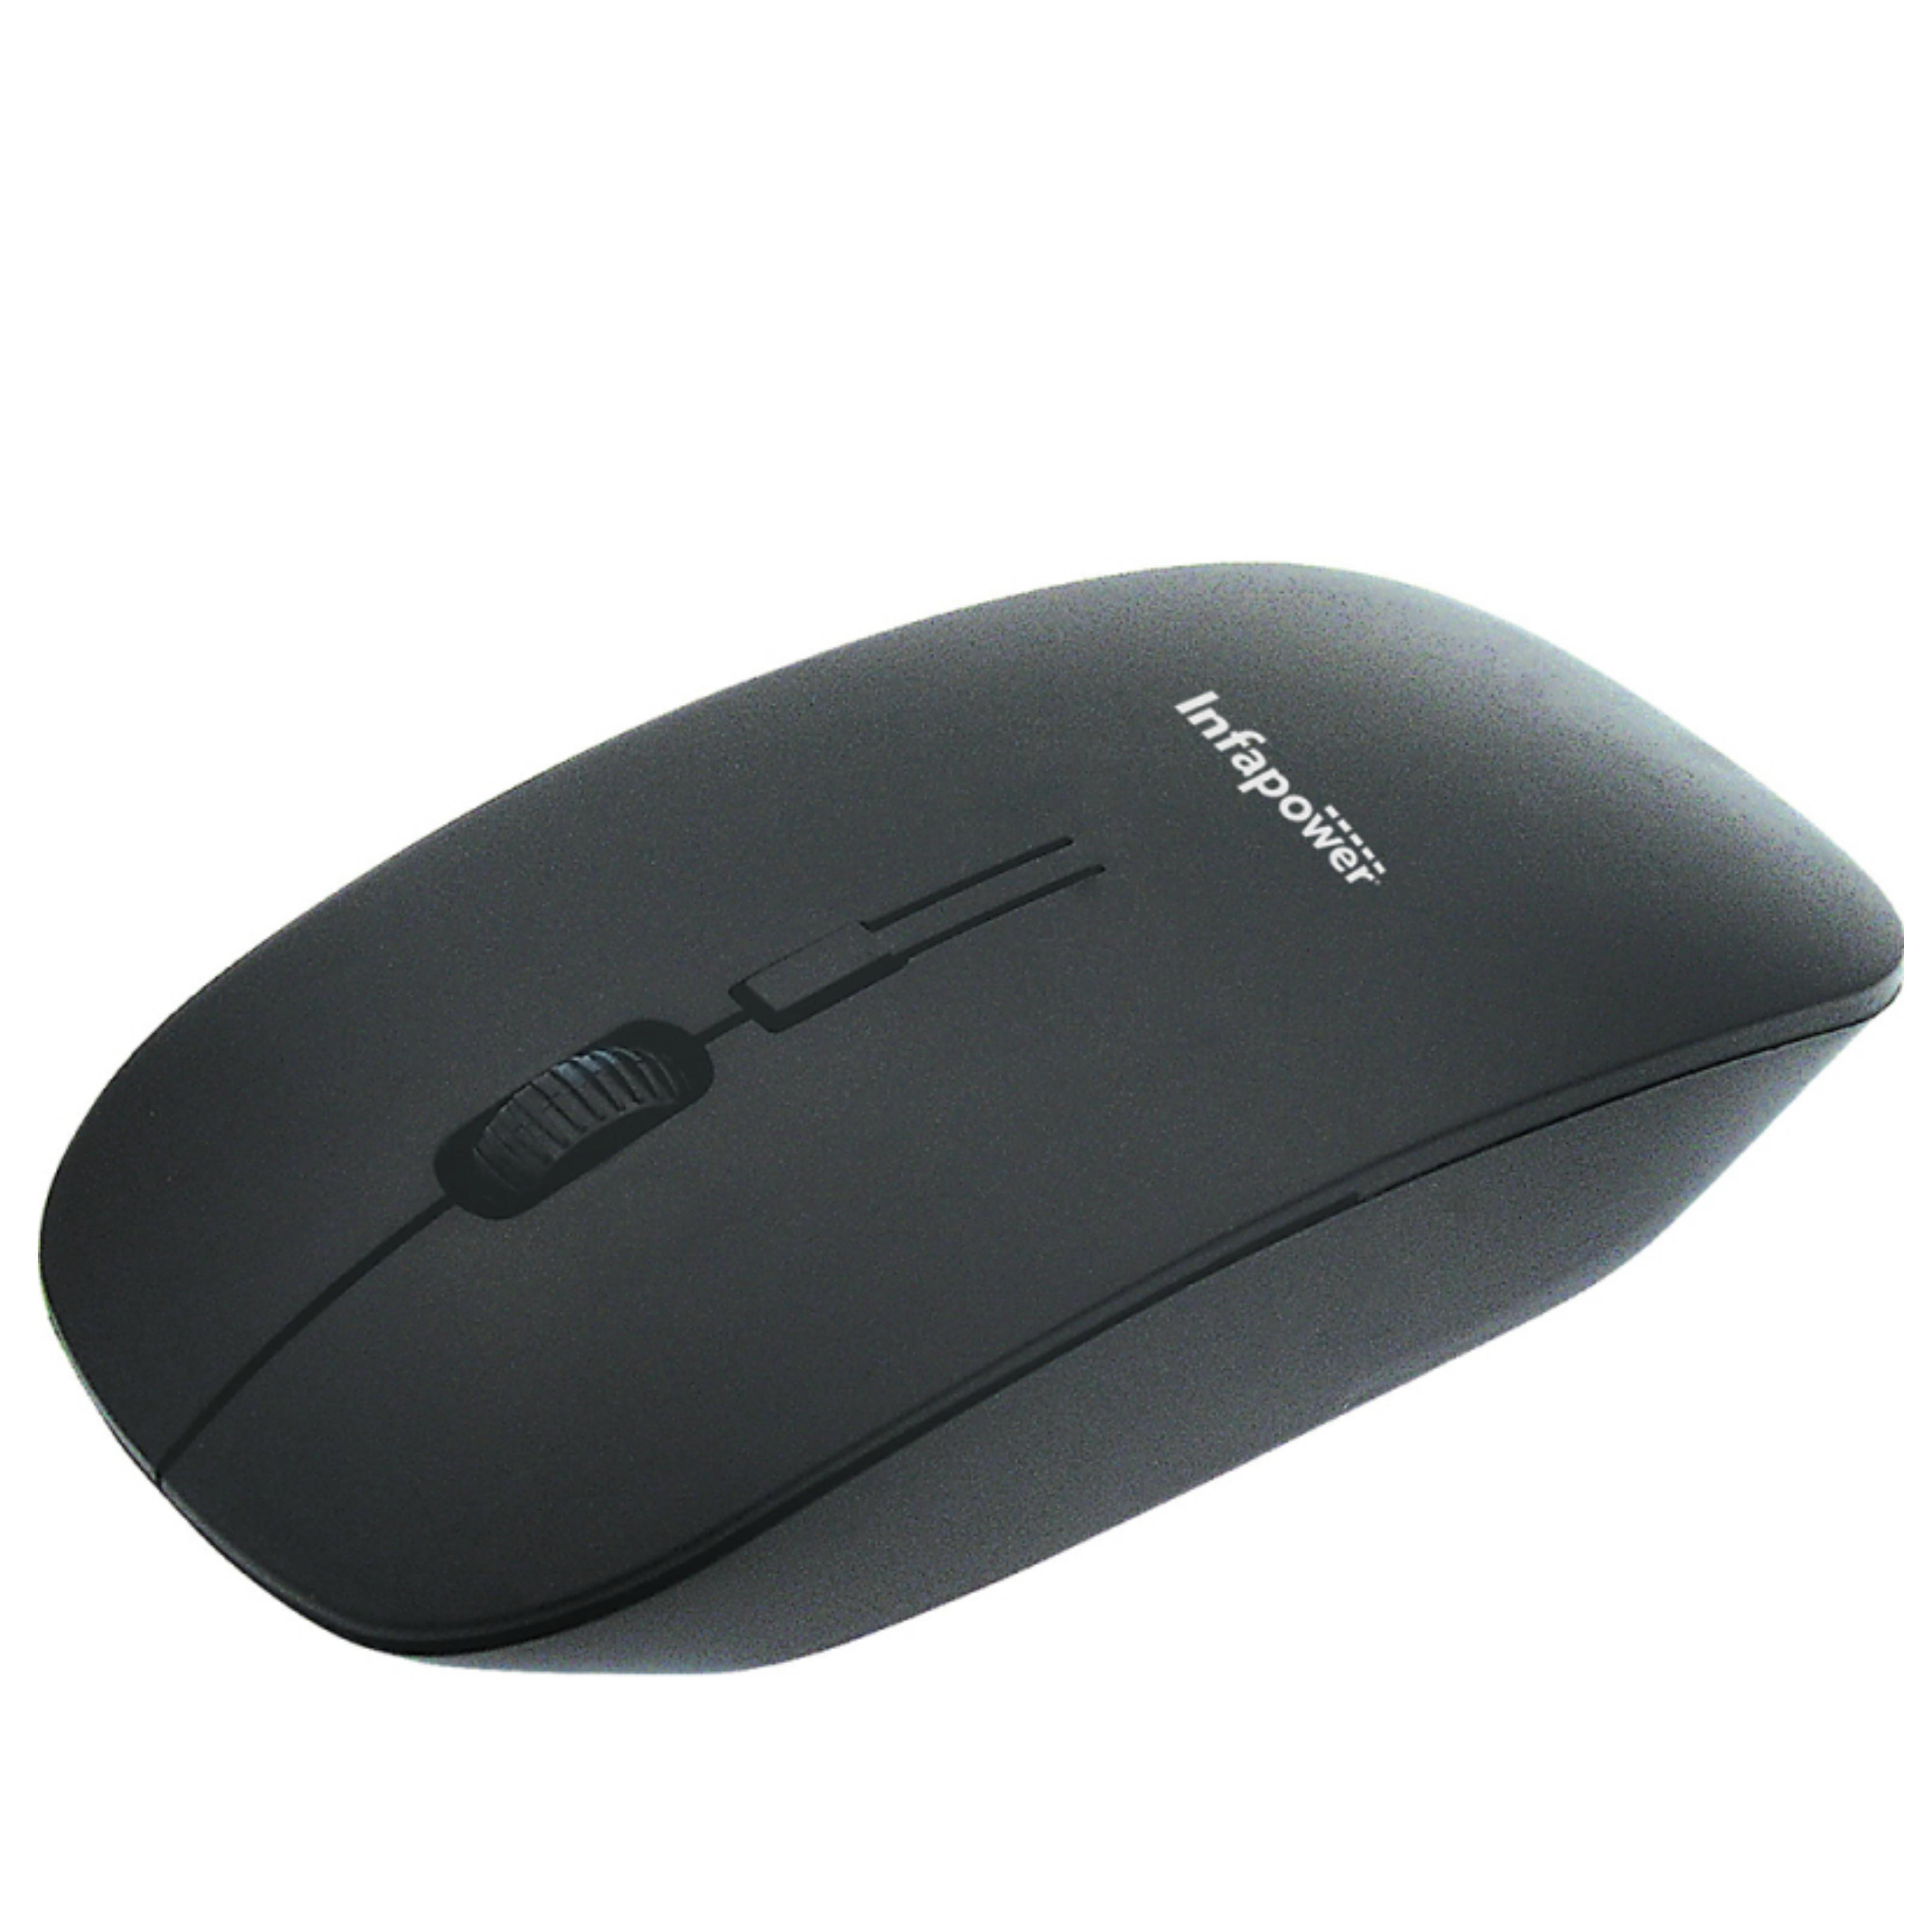 Infapower X205 Wireless Optical Mouse|PC/MAC|2 Button Design|Scroll Wheel|Black|